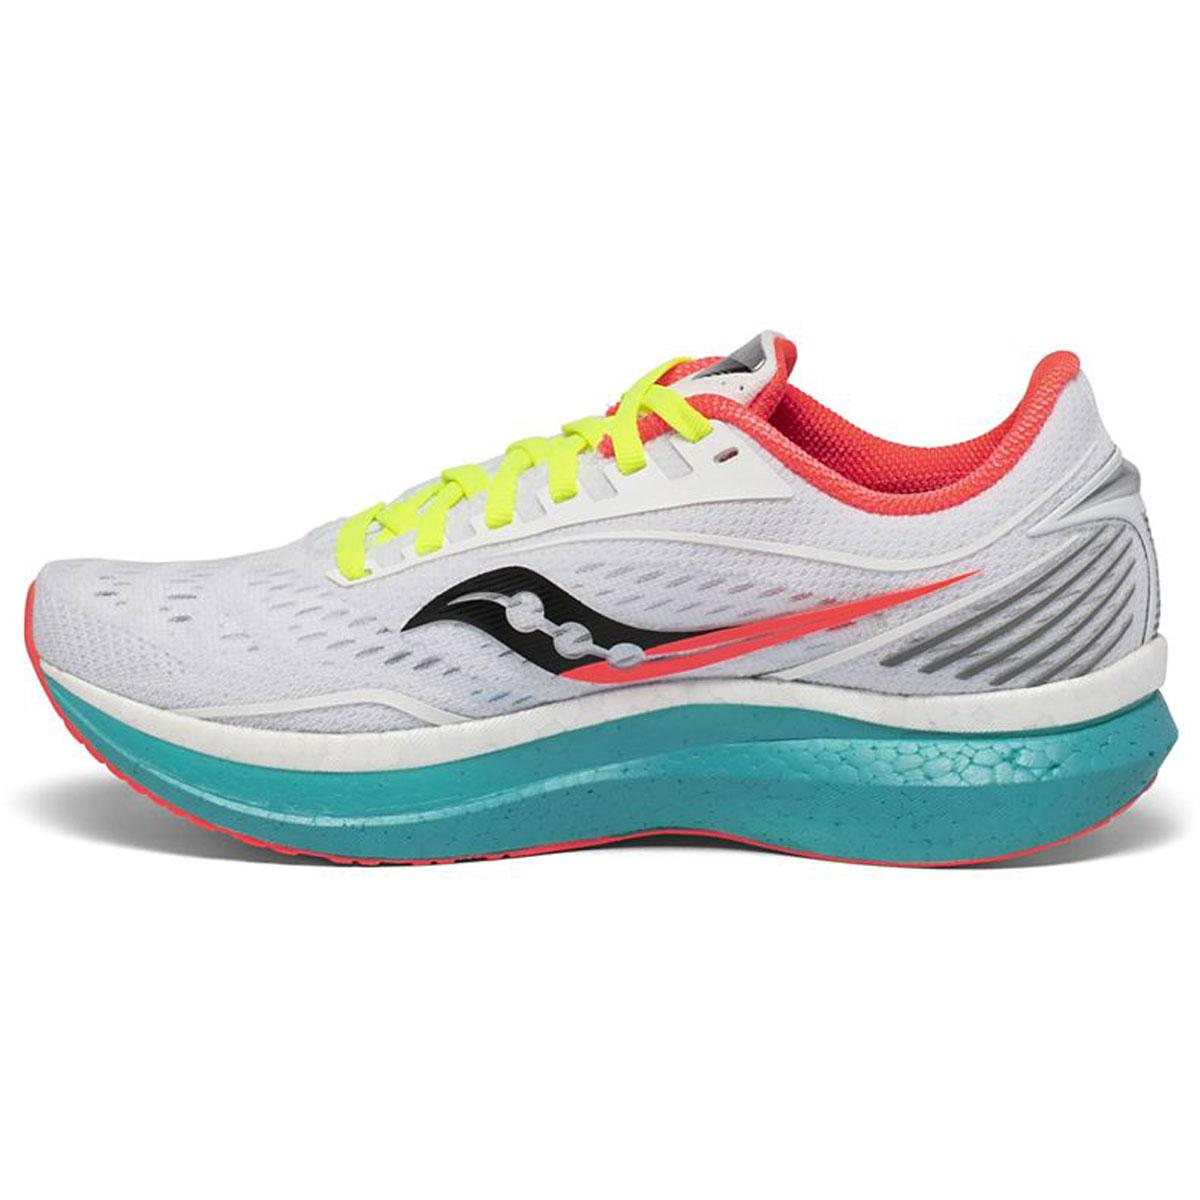 Women's Saucony Endorphin Speed Running Shoe - Color: Moonrock/Mutant - Size: 5 - Width: Regular, Moonrock/Mutant, large, image 2